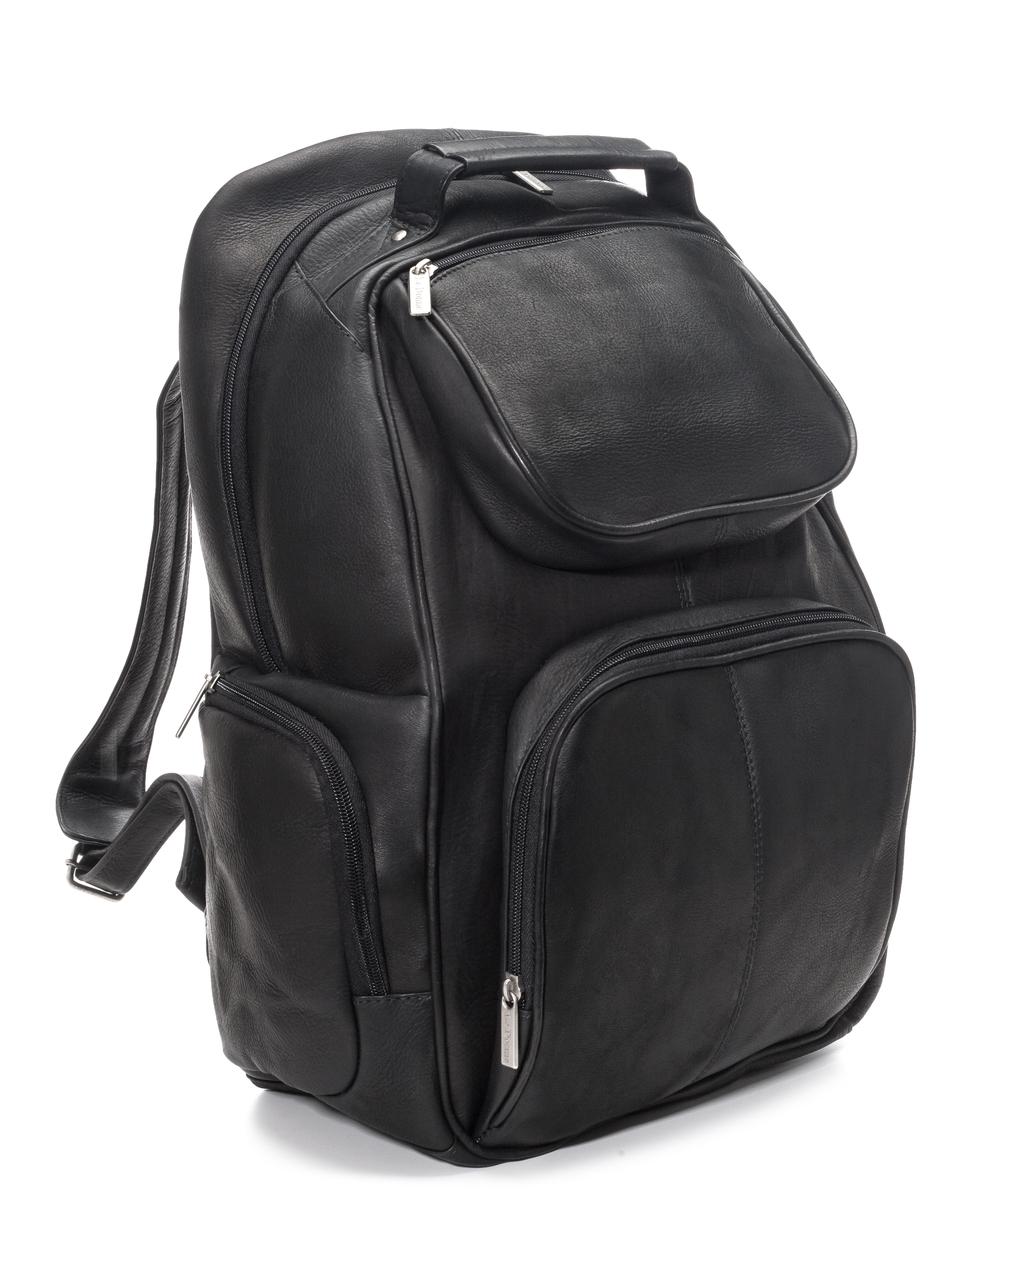 Backpacks With Laptop Pocket 6WoGIE0O